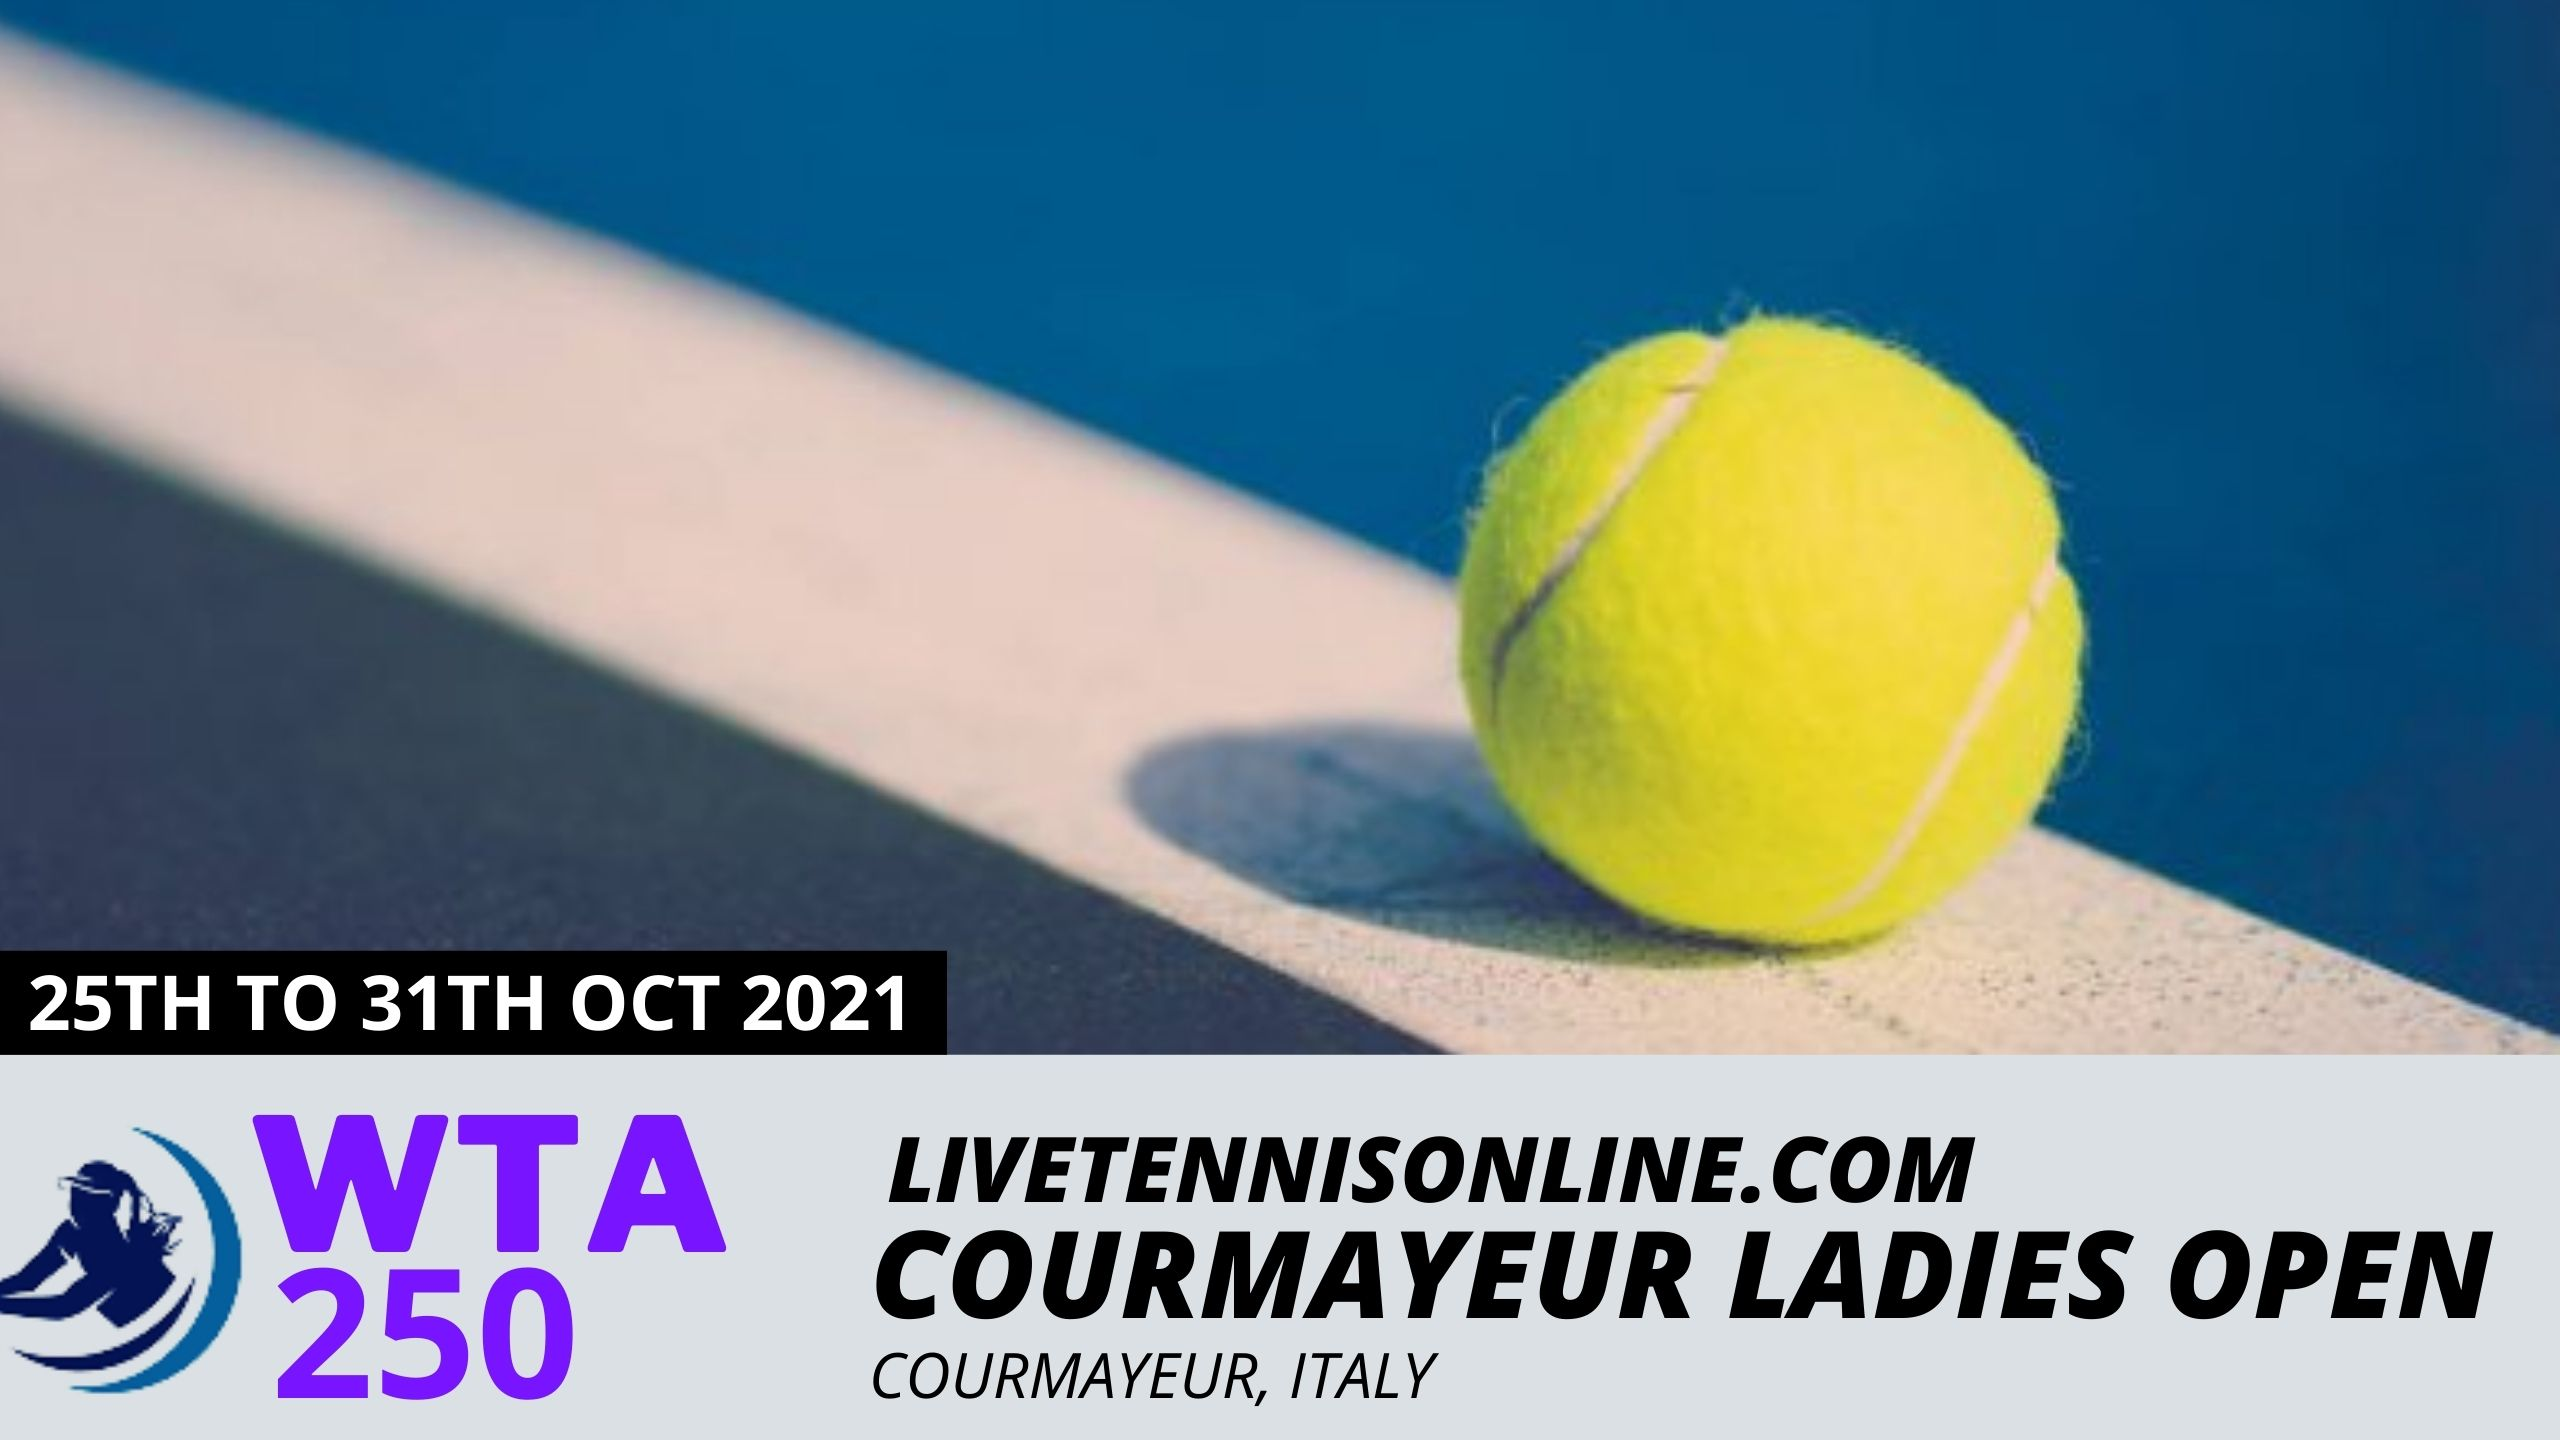 Courmayeur Ladies Open Tennis Live Stream